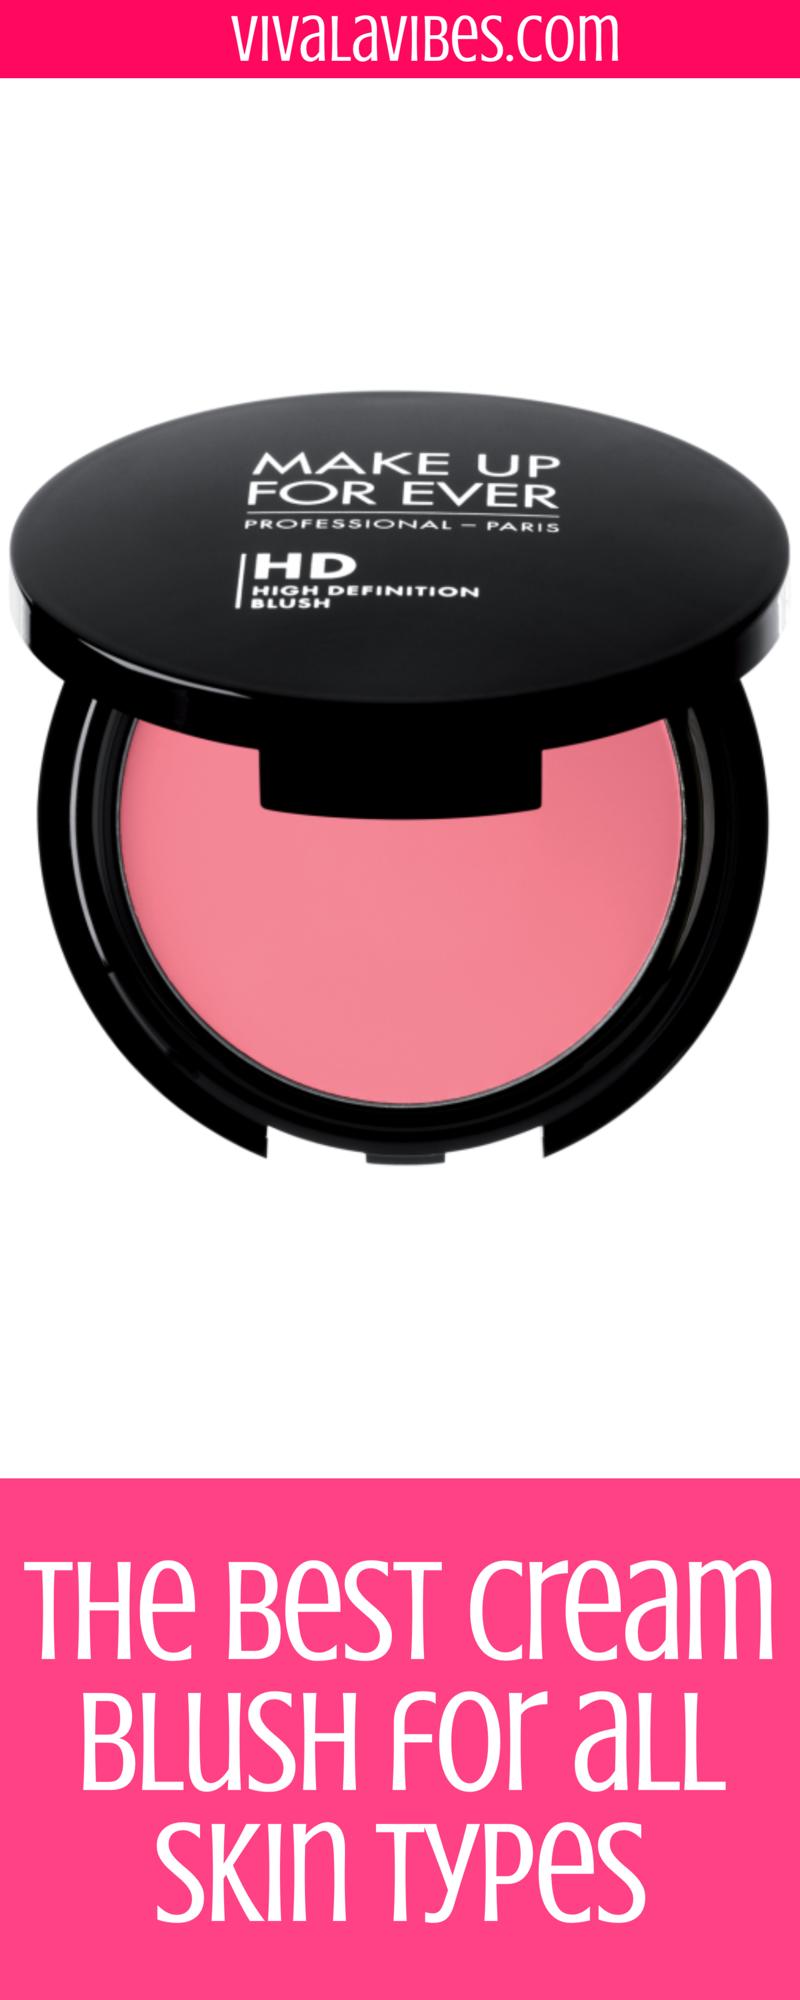 The Best Cream Blush for ALL Skin Types  et orgeous  Pinterest